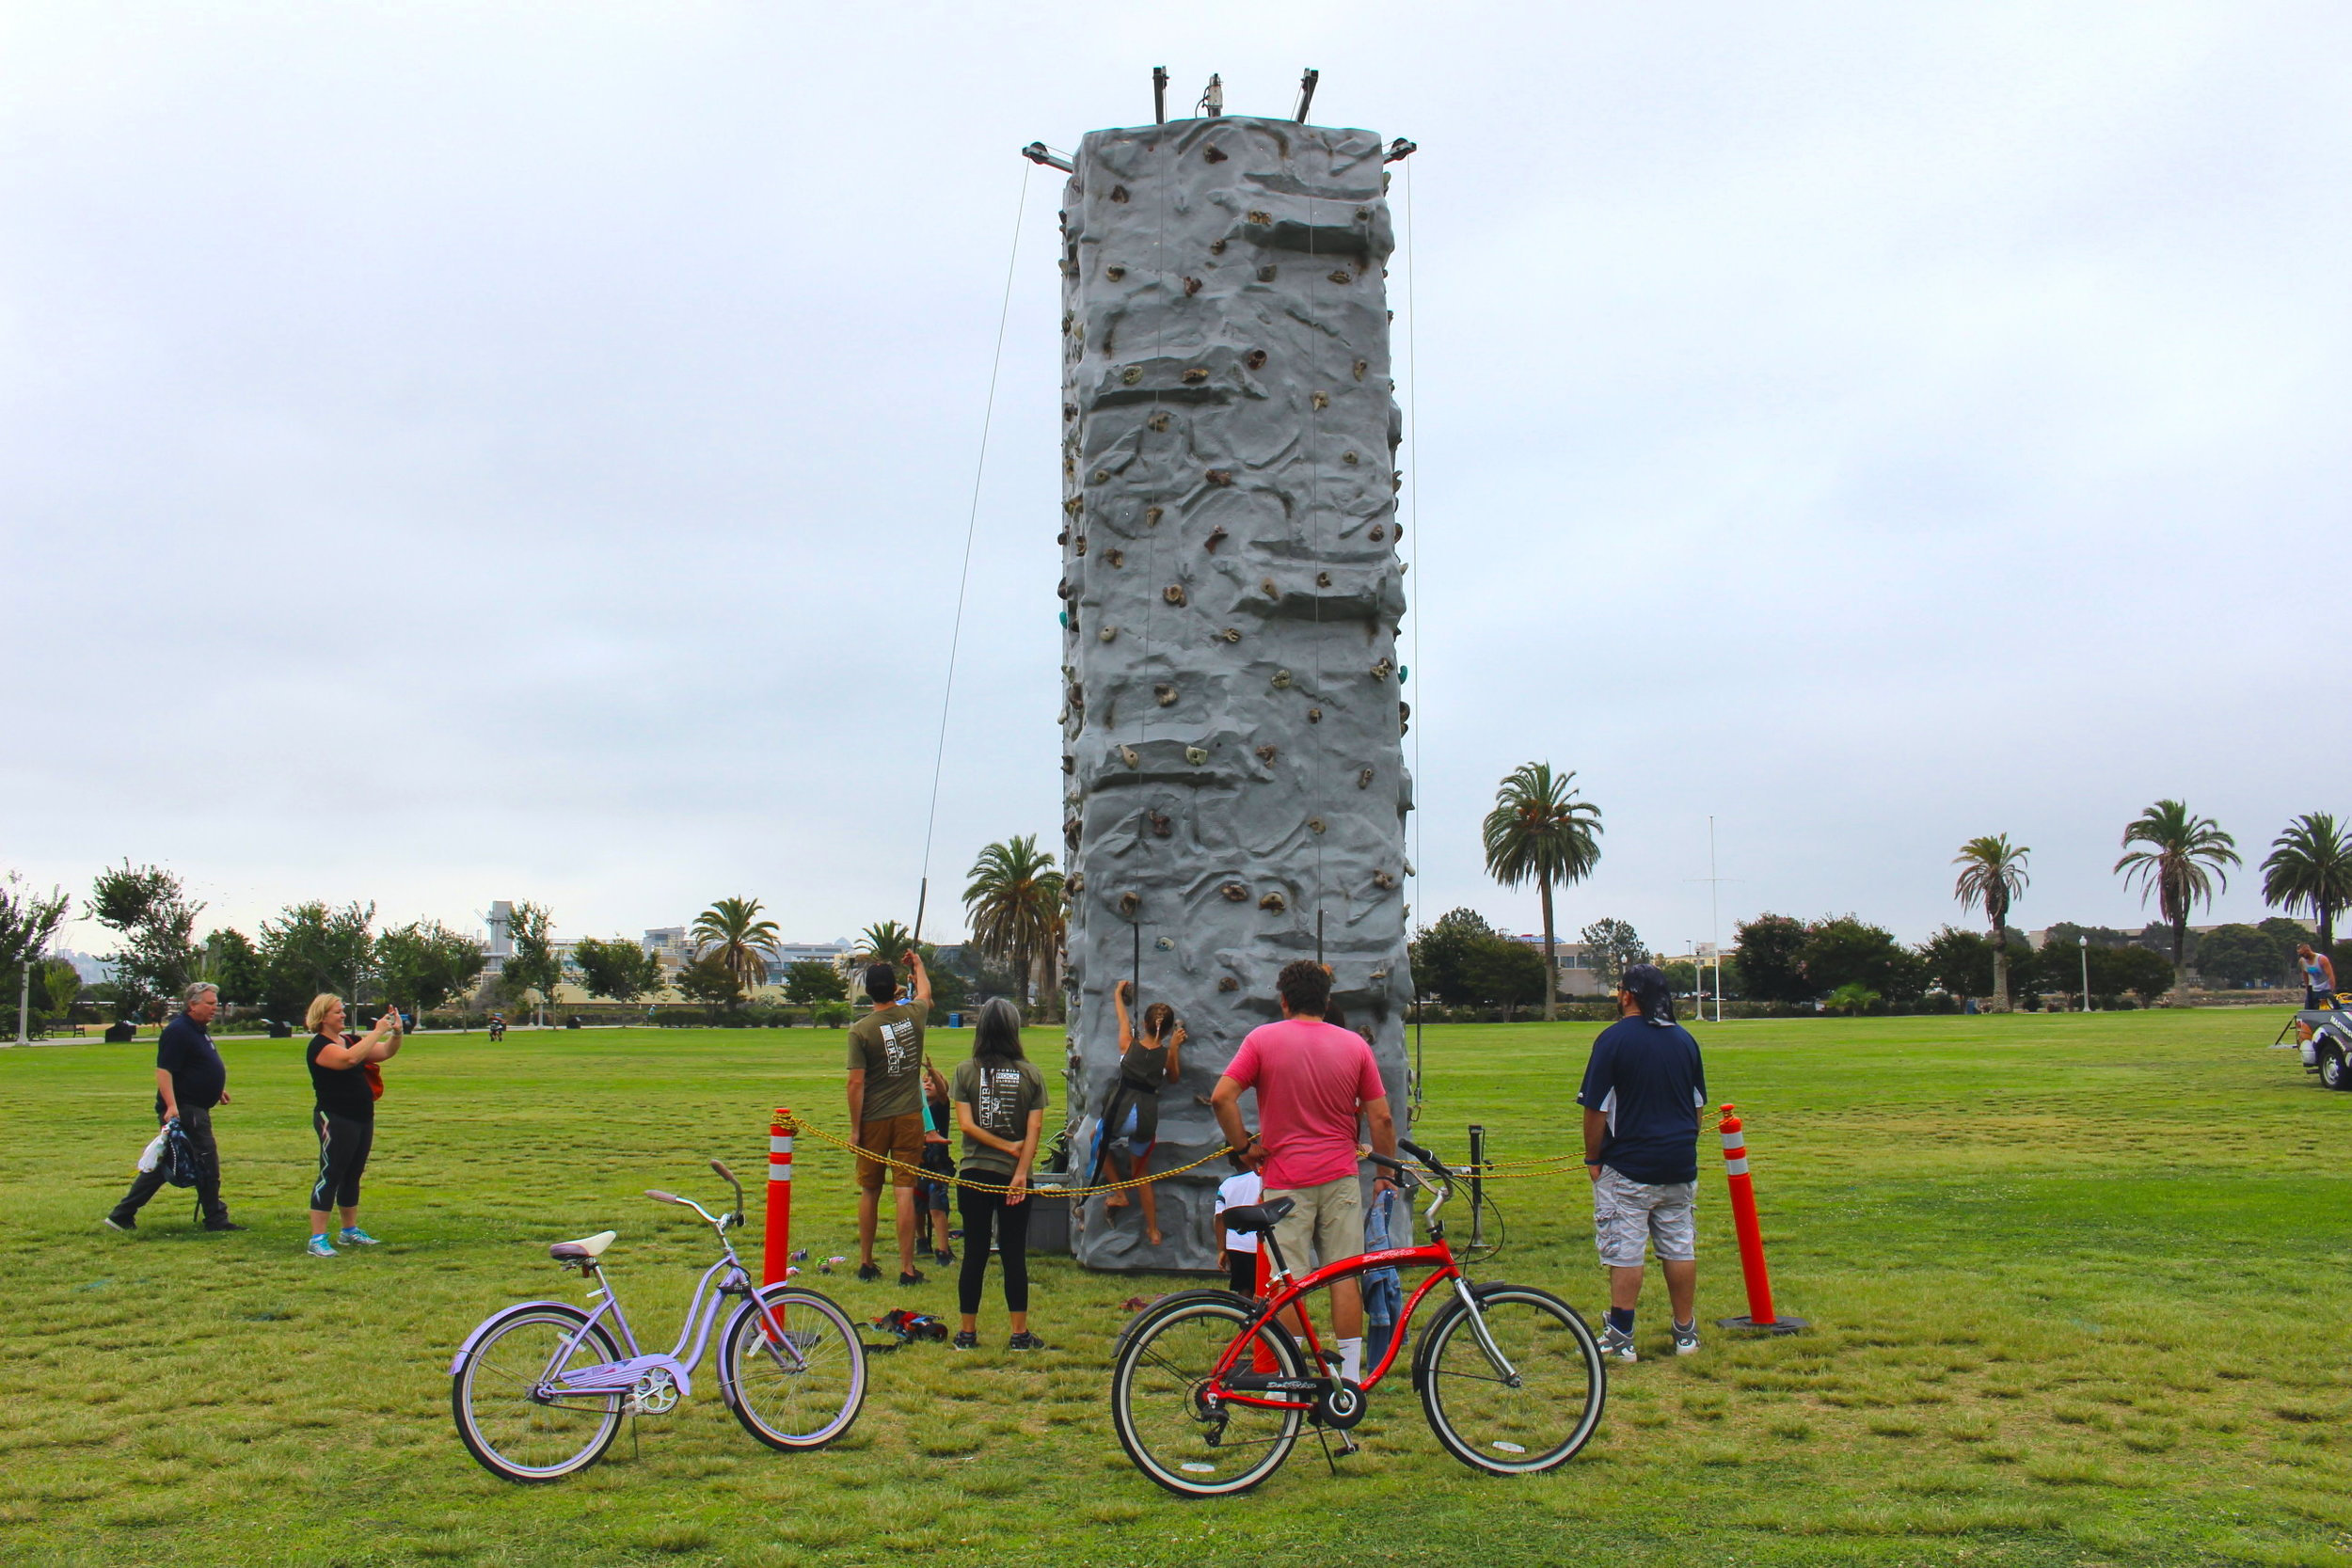 Rock Climbing Wall Full-size